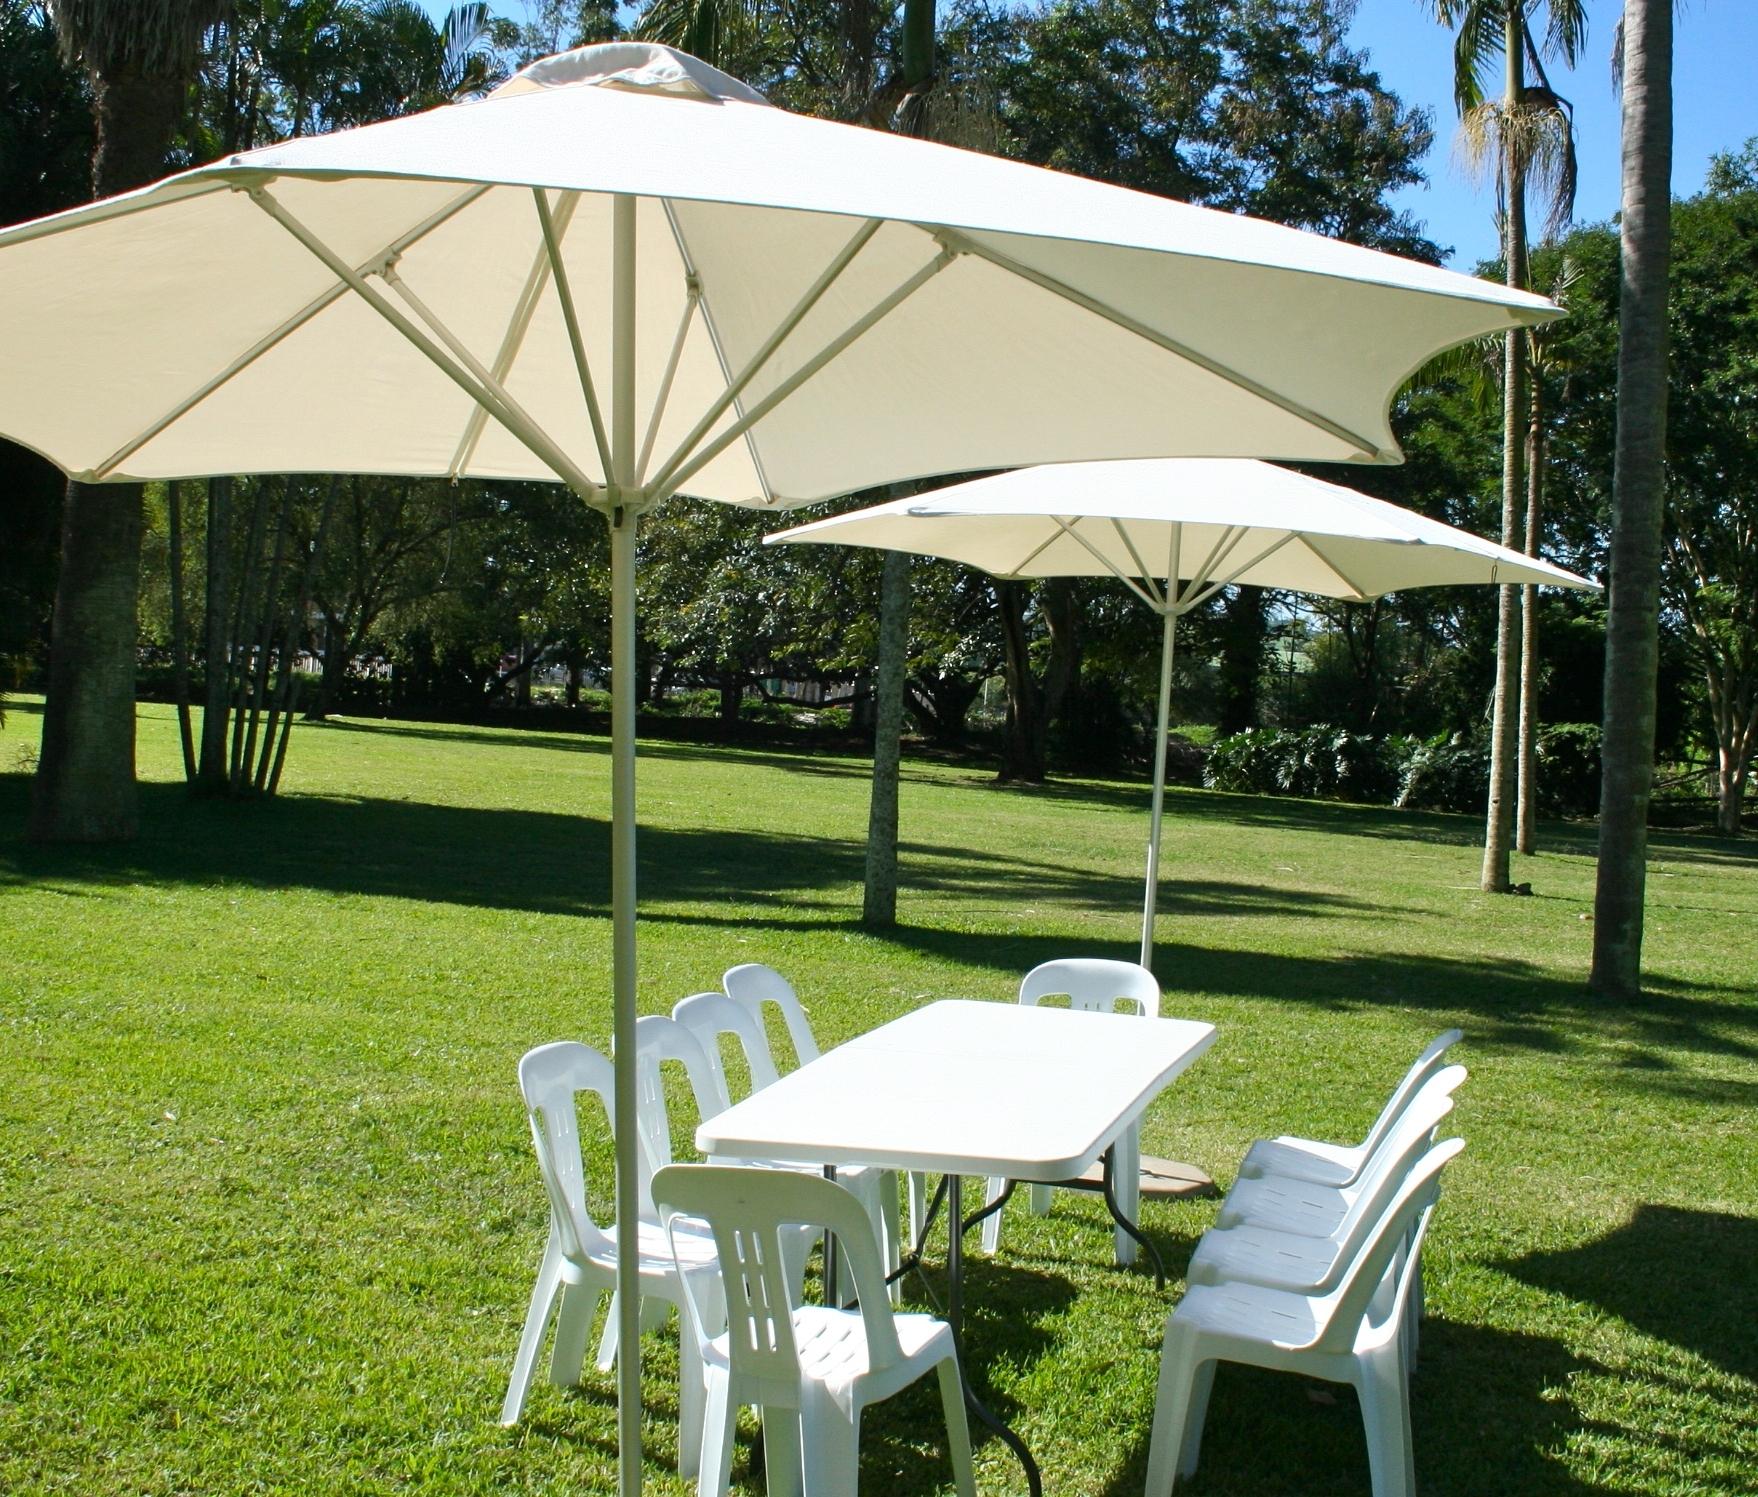 Outdoor Patio Umbrella Rental Umbrella Hire Within Best And Newest White Patio Umbrellas (Gallery 18 of 20)